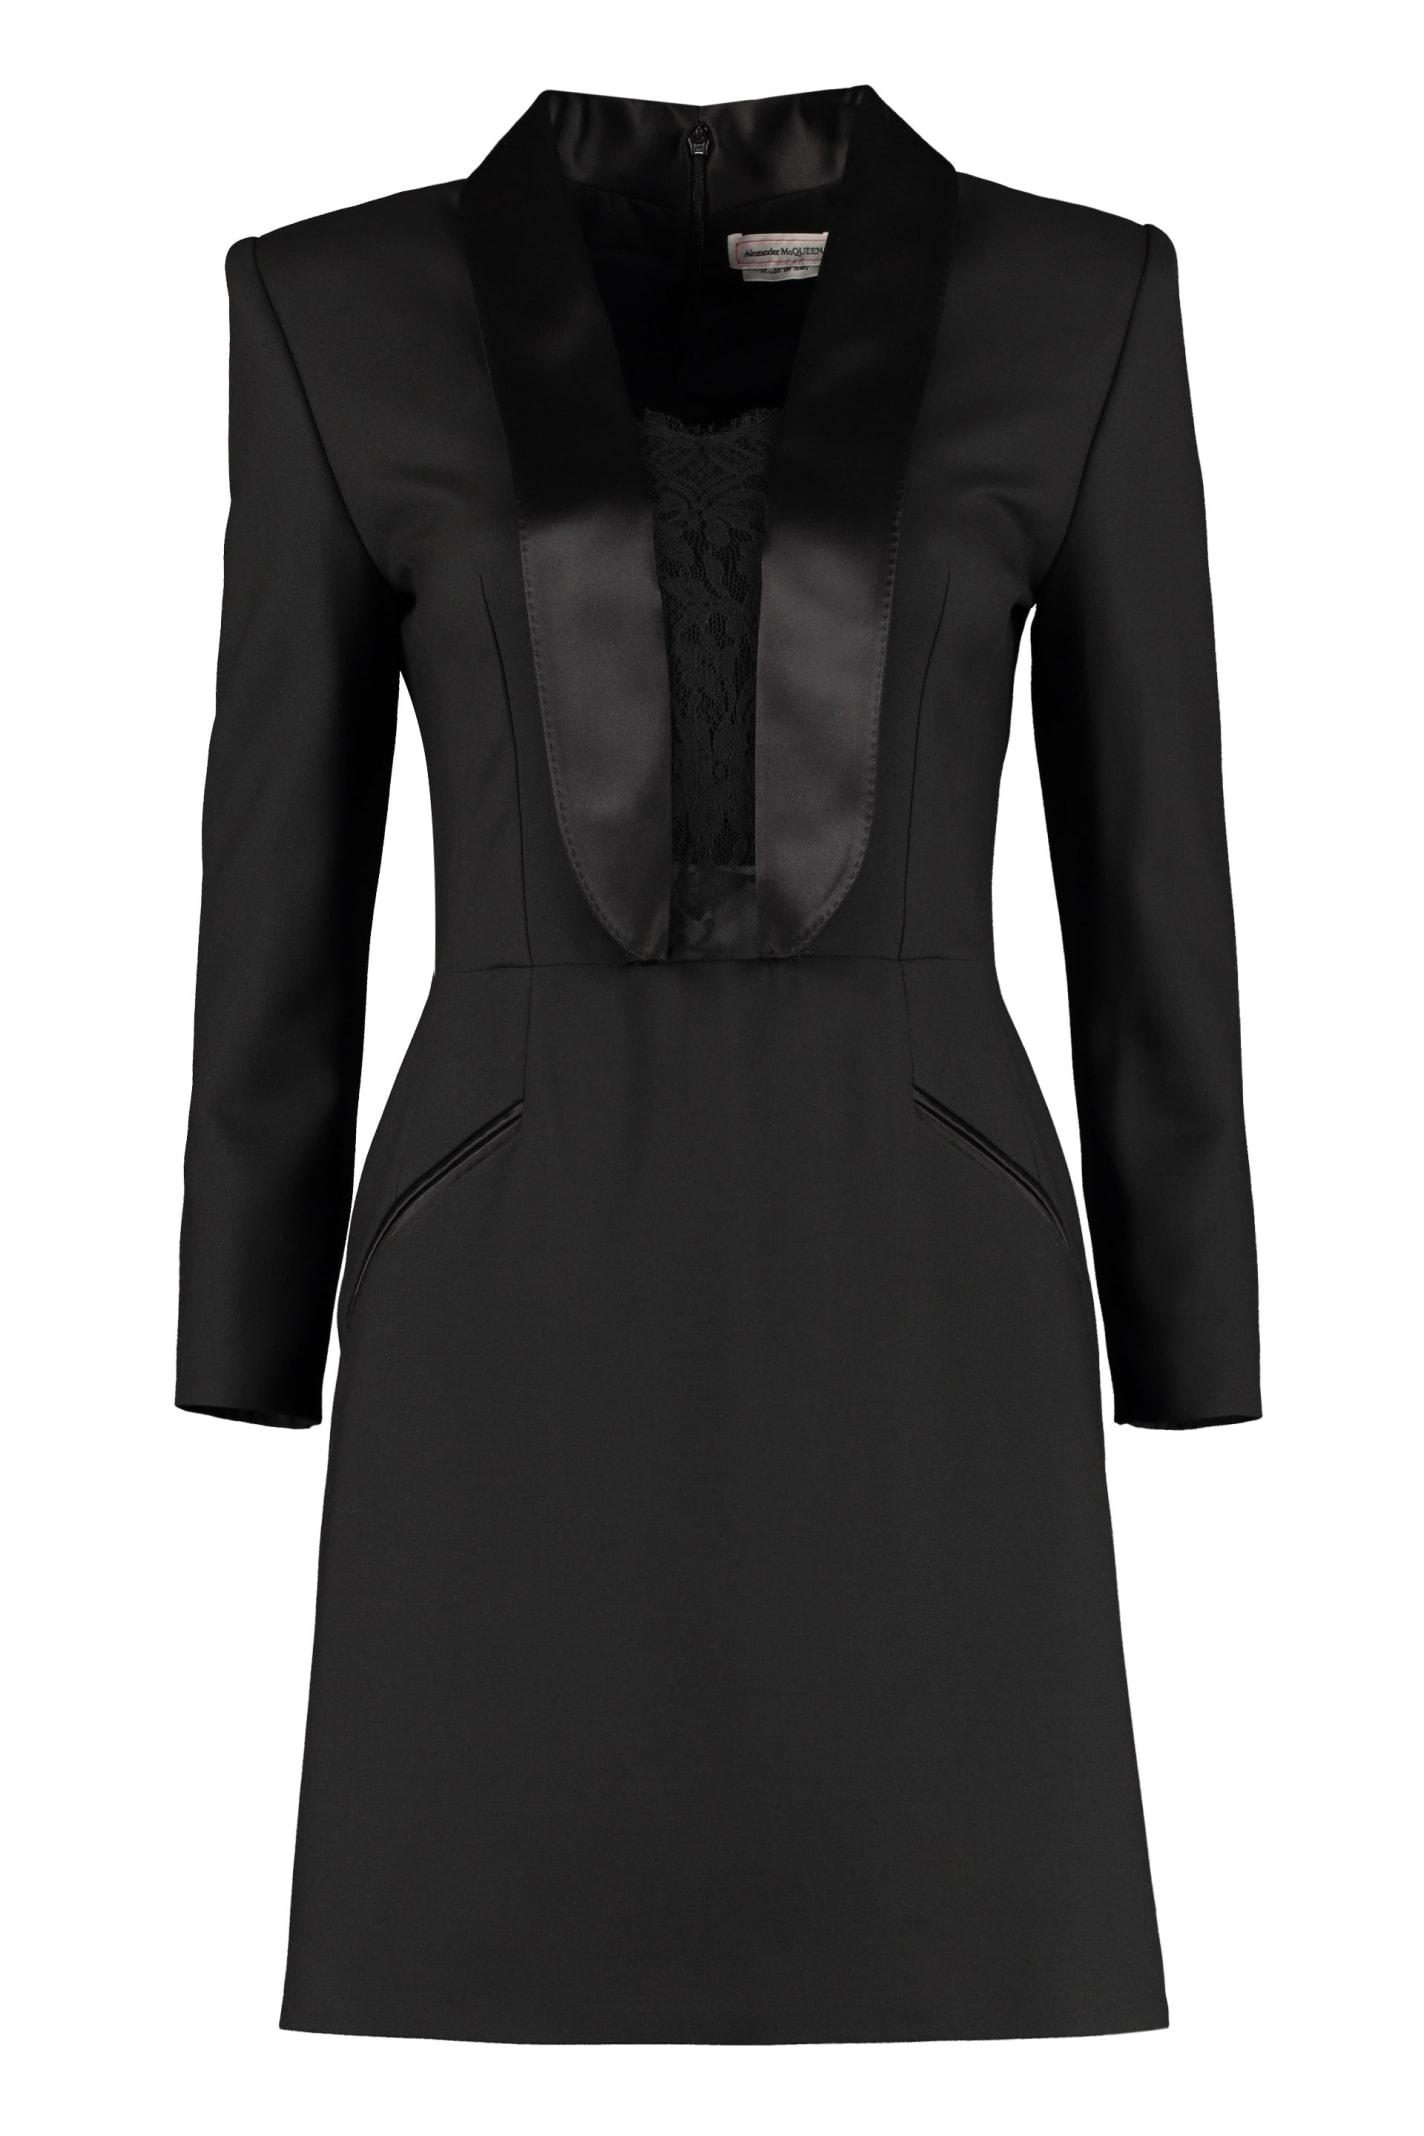 Alexander McQueen Blazer Dress With Lace Details